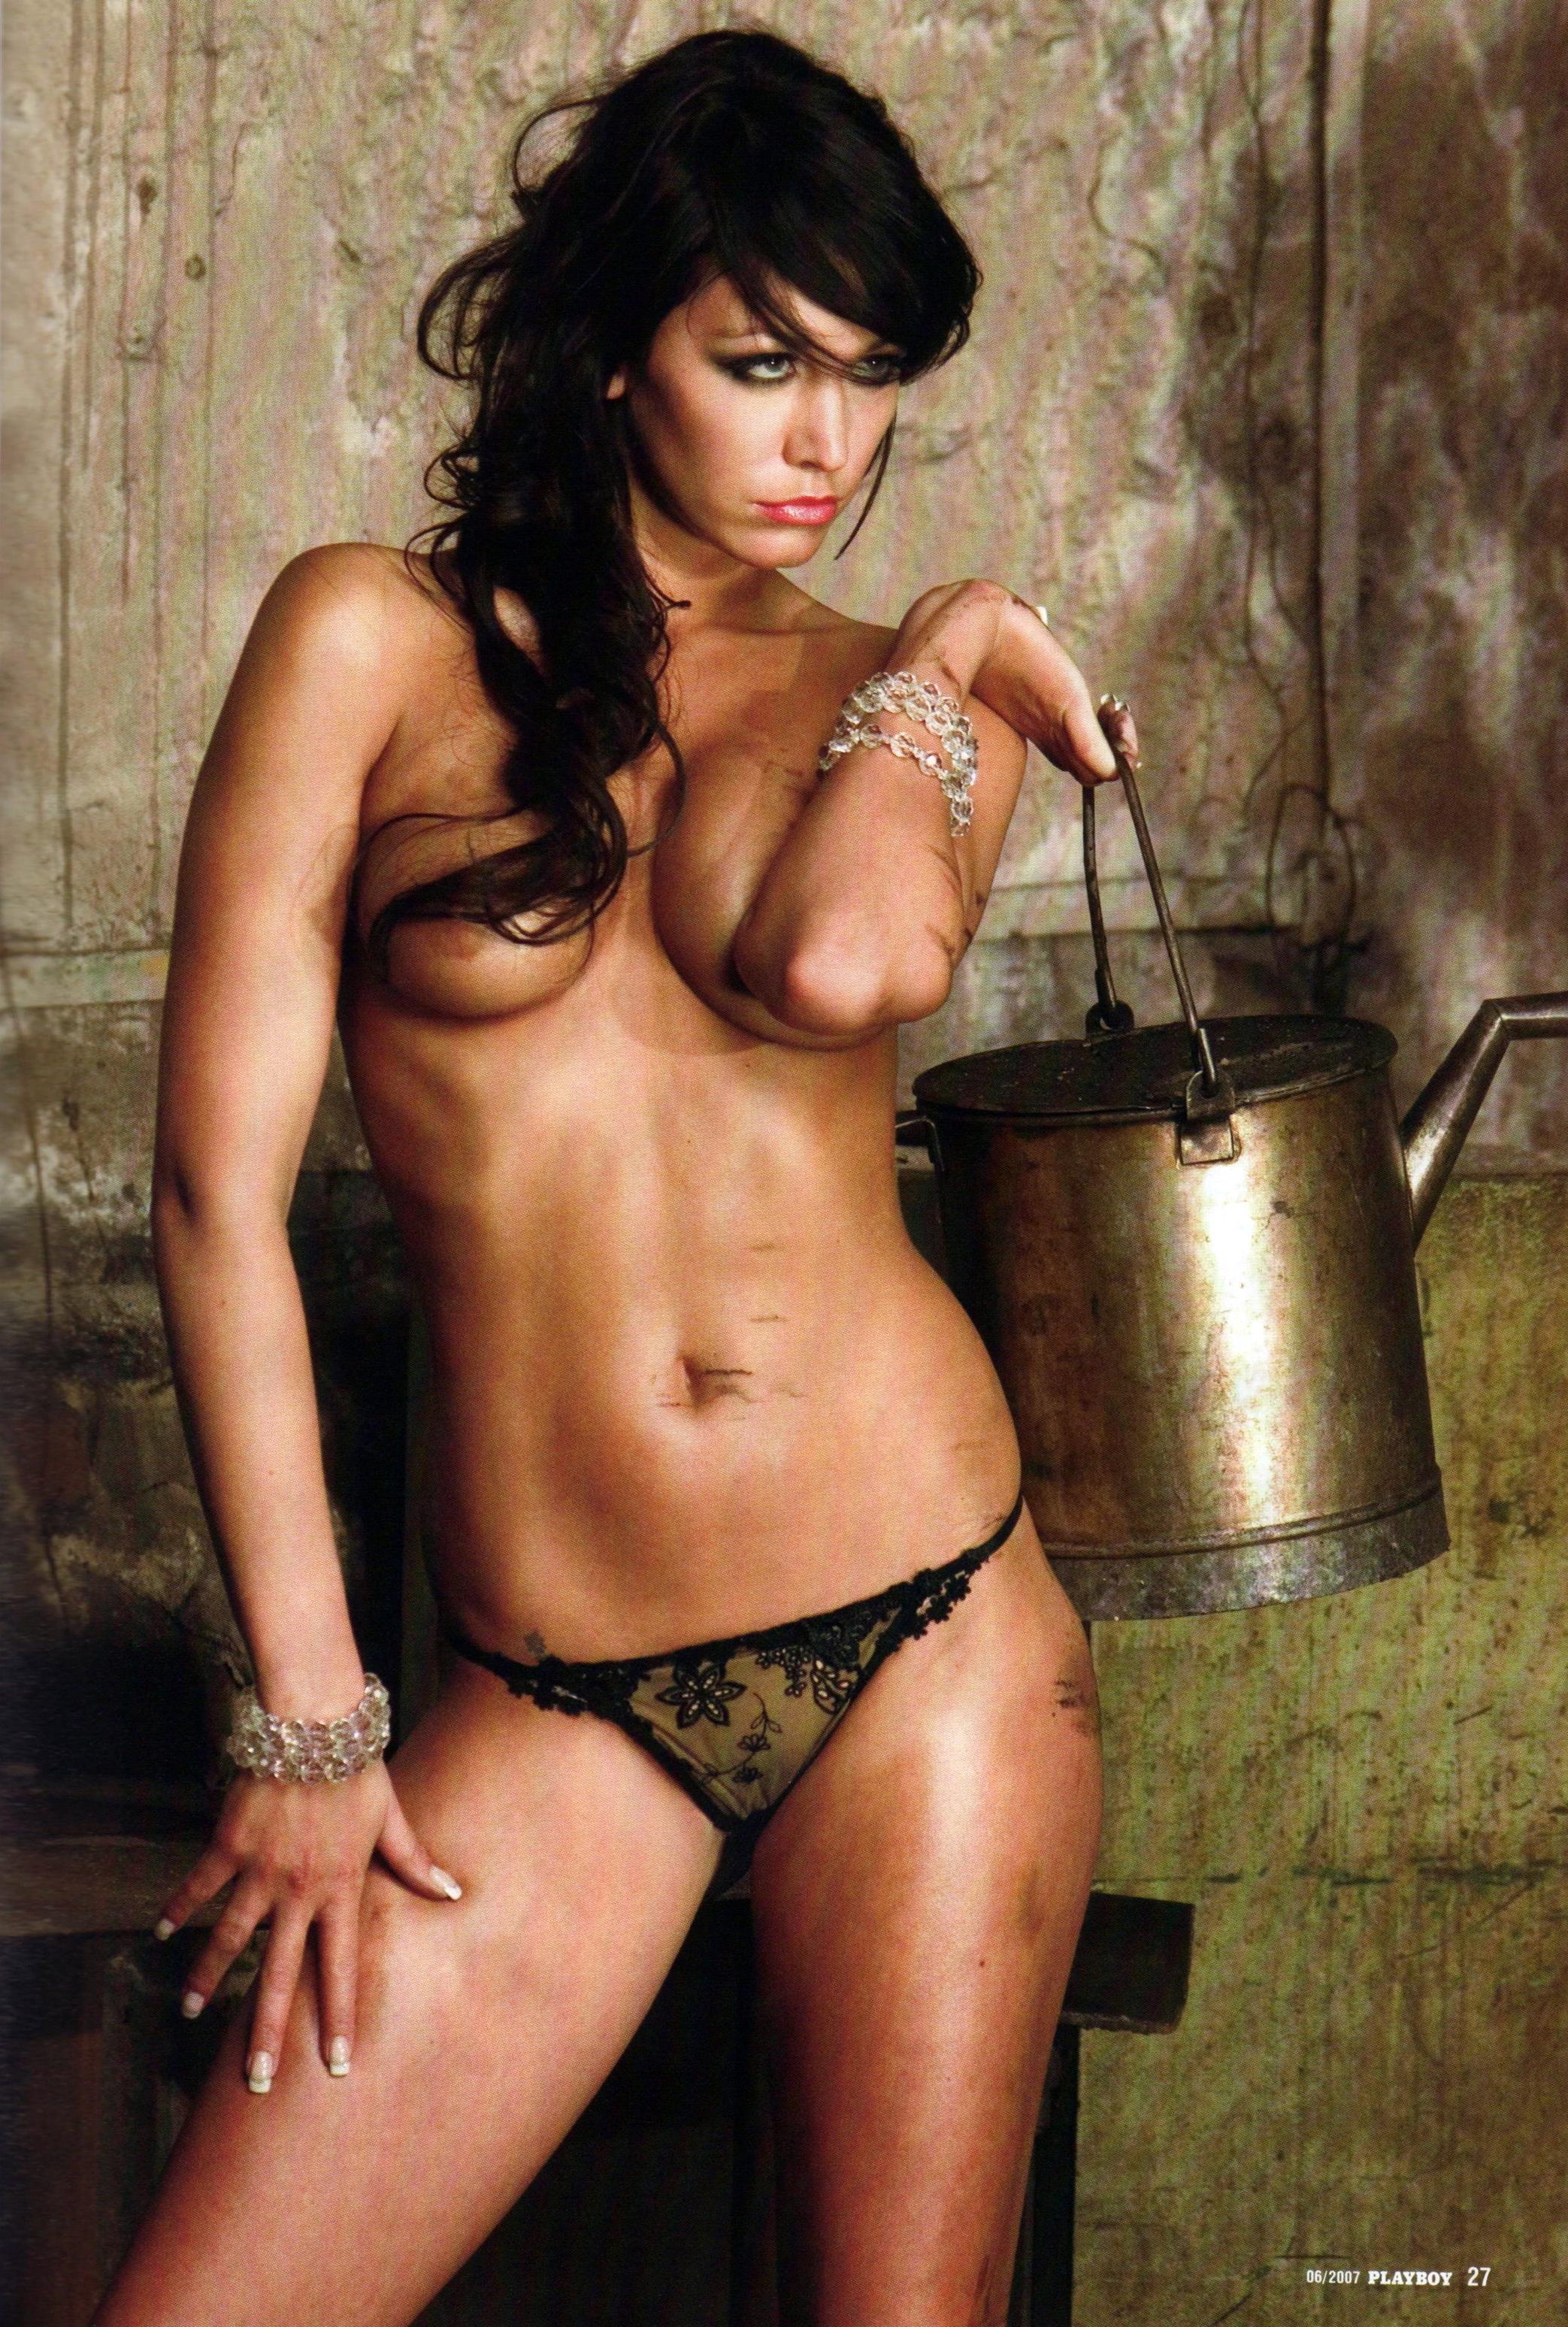 682616778_AgataHanichova_Playboy2007_erven_027_122_187lo.jpg